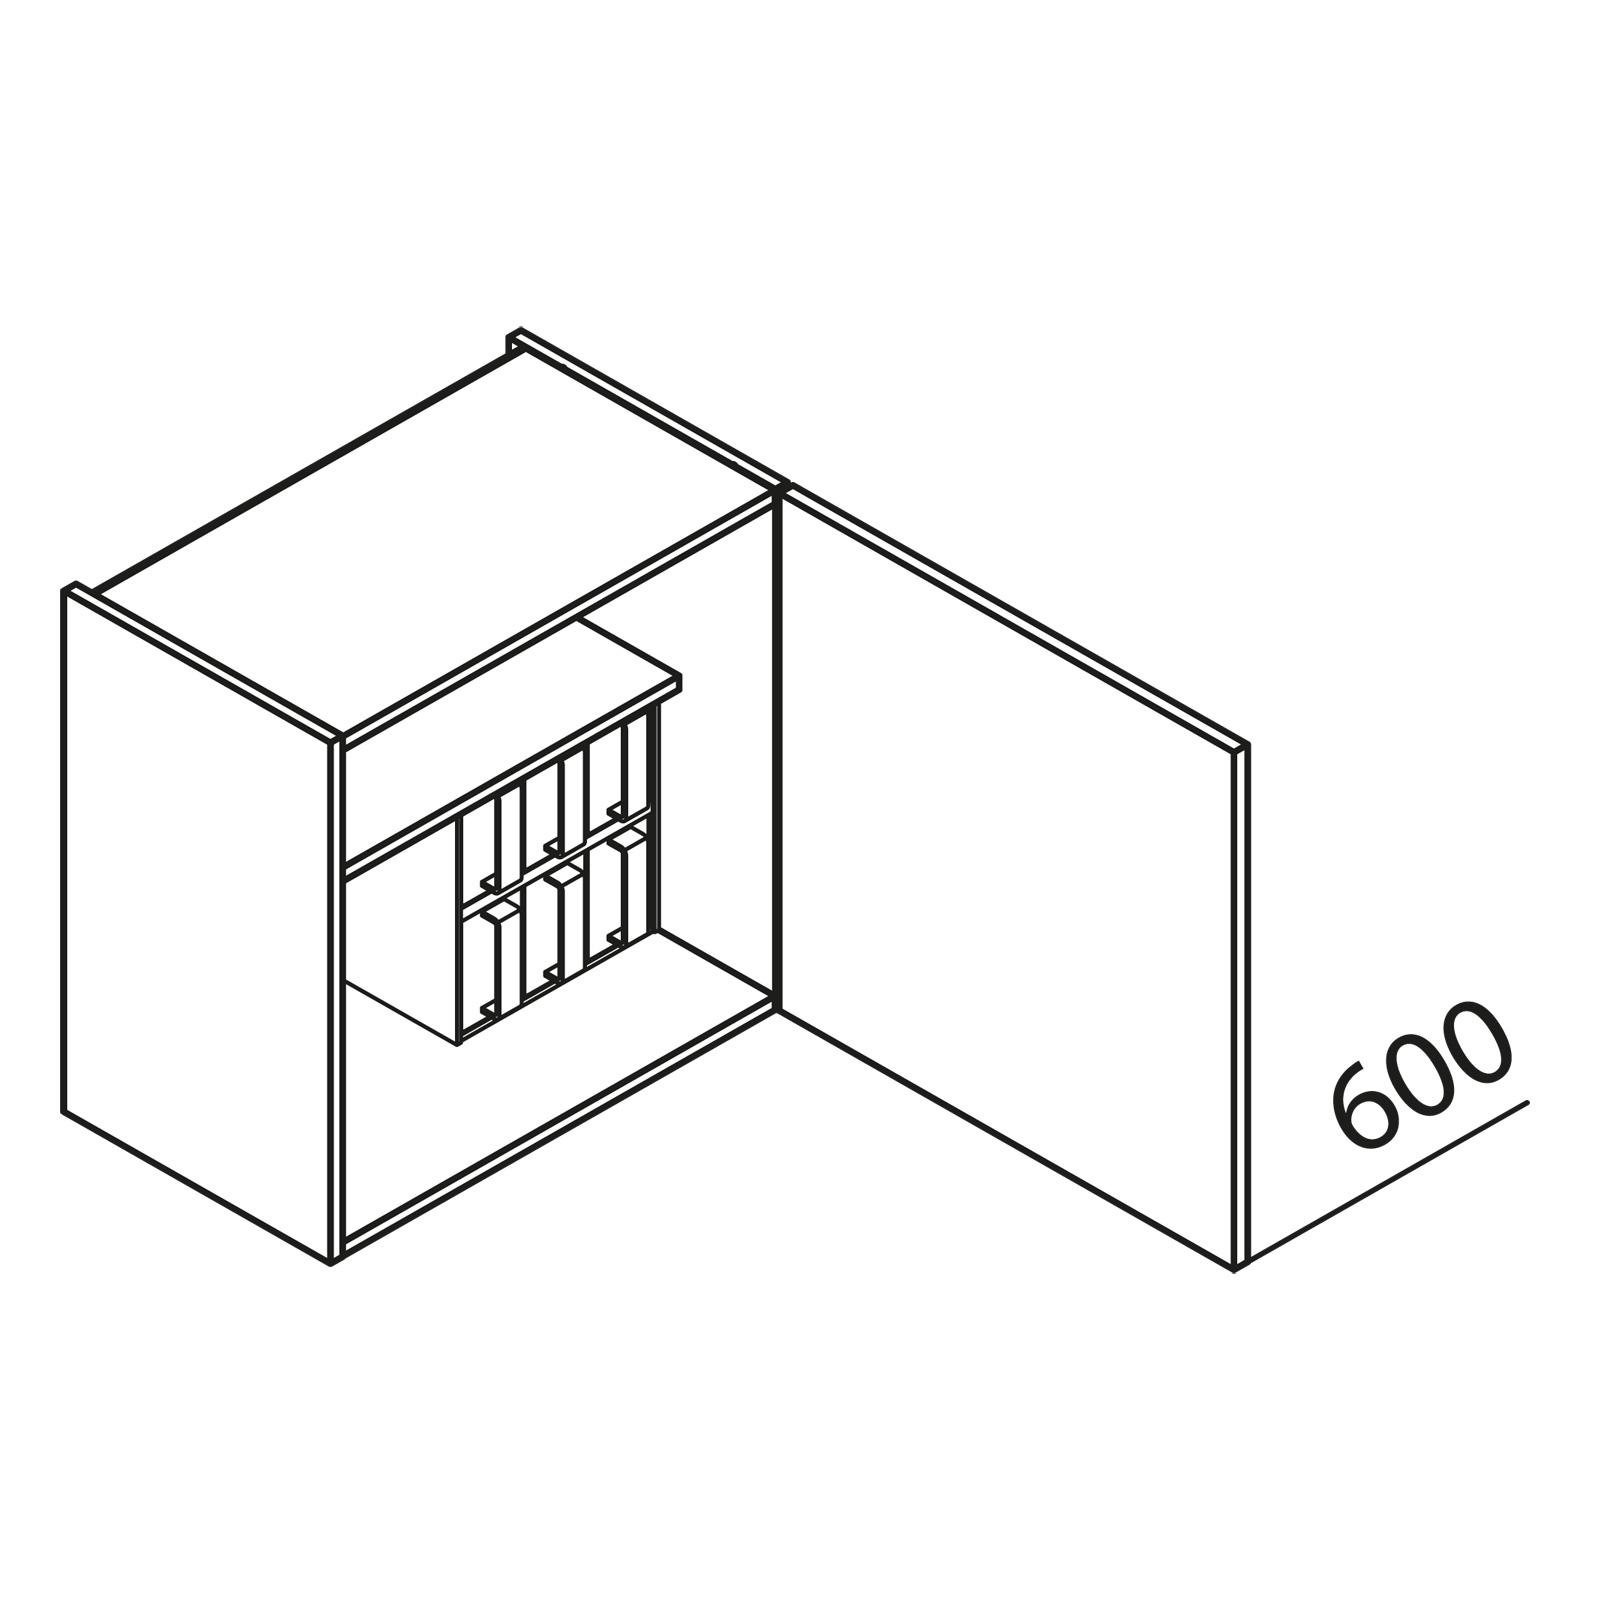 nolte k chen h ngeschrank gew rzschrank hg60 60. Black Bedroom Furniture Sets. Home Design Ideas